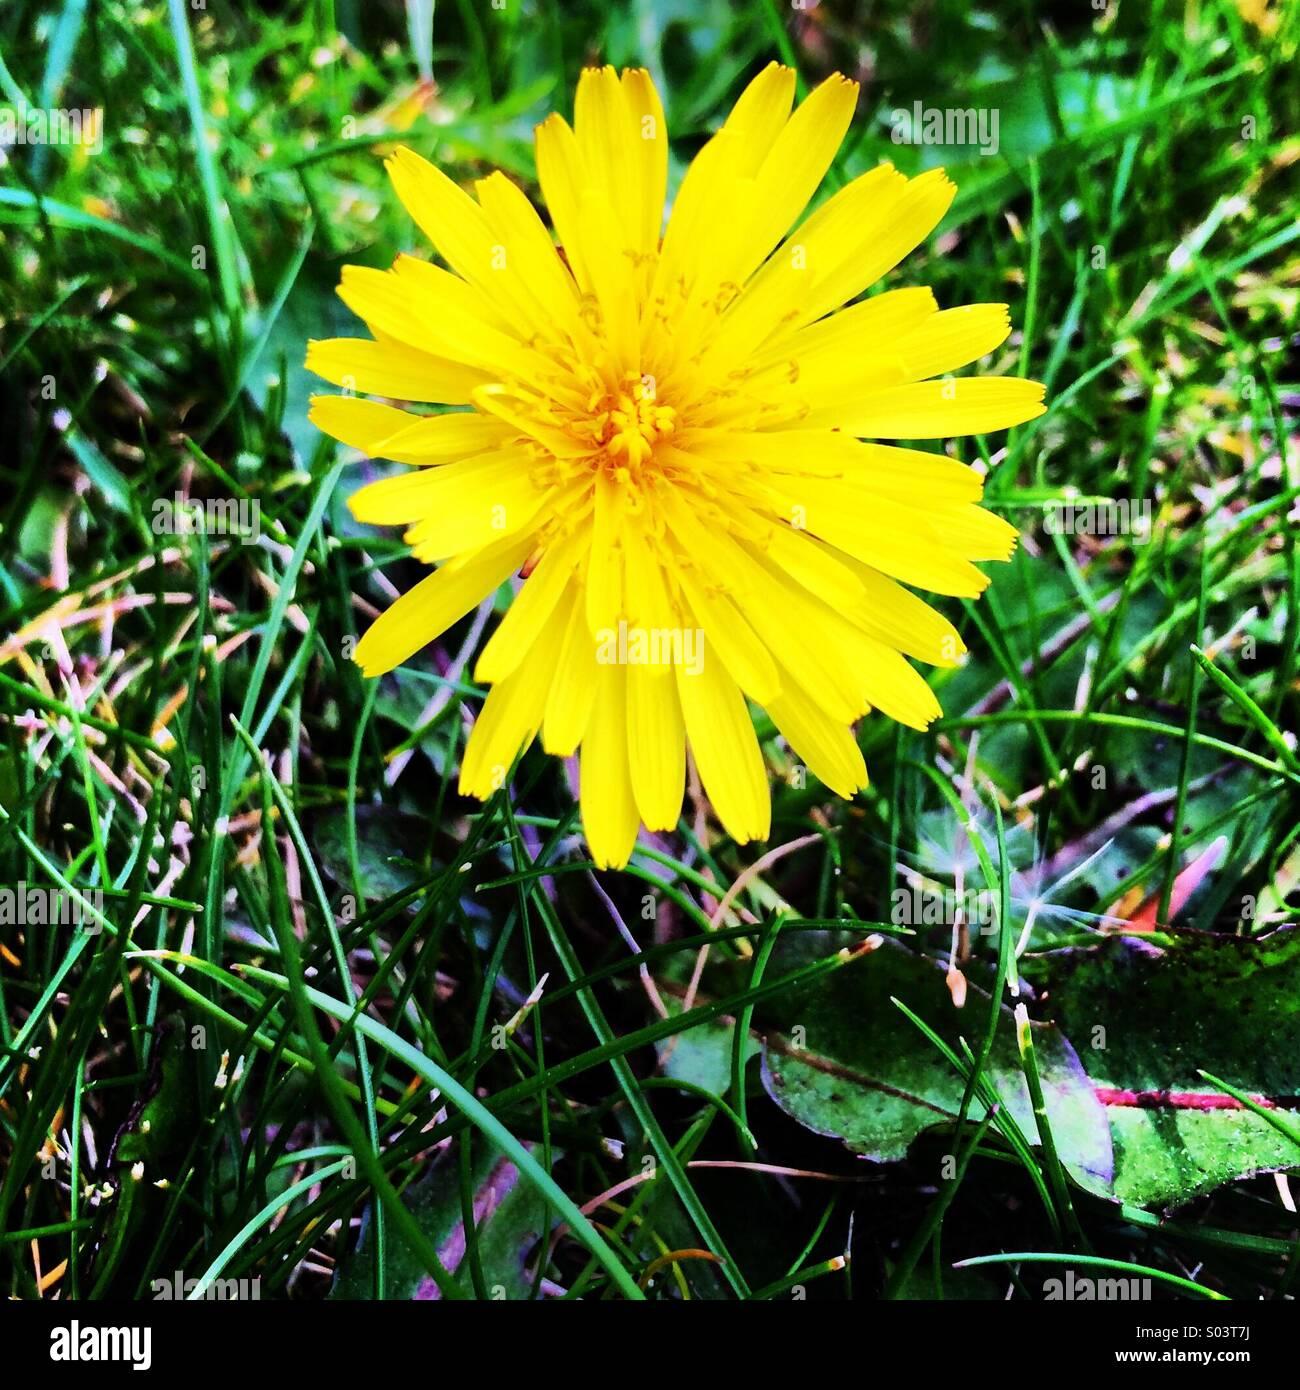 Fiori Gialli Tarassaco.Fiore Giallo Tarassaco Weed Fiore Foto Immagine Stock 309871510